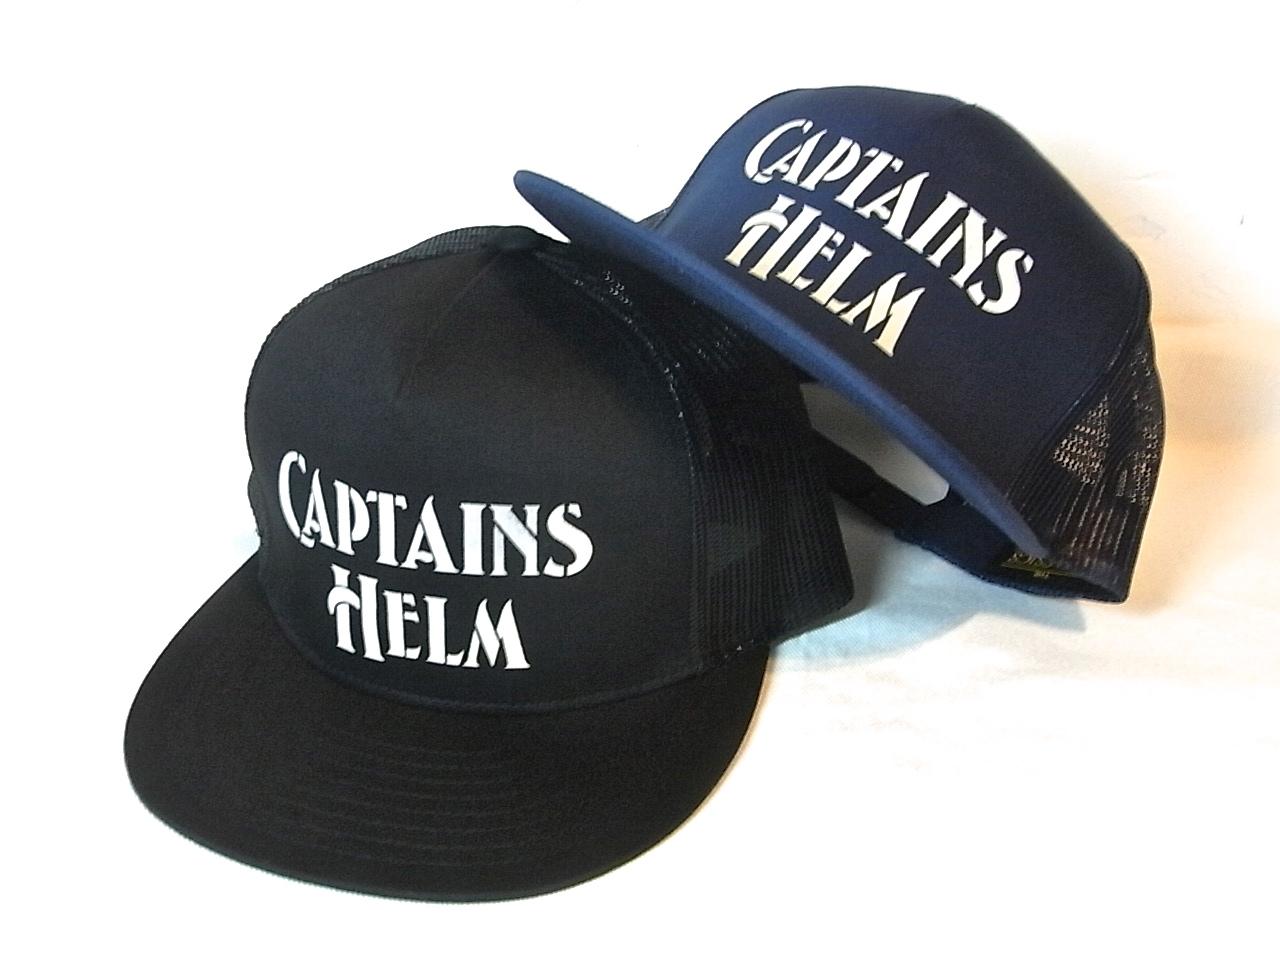 CAPTAINS HELM NEW ITEMS!!!!!_d0101000_13494047.jpg